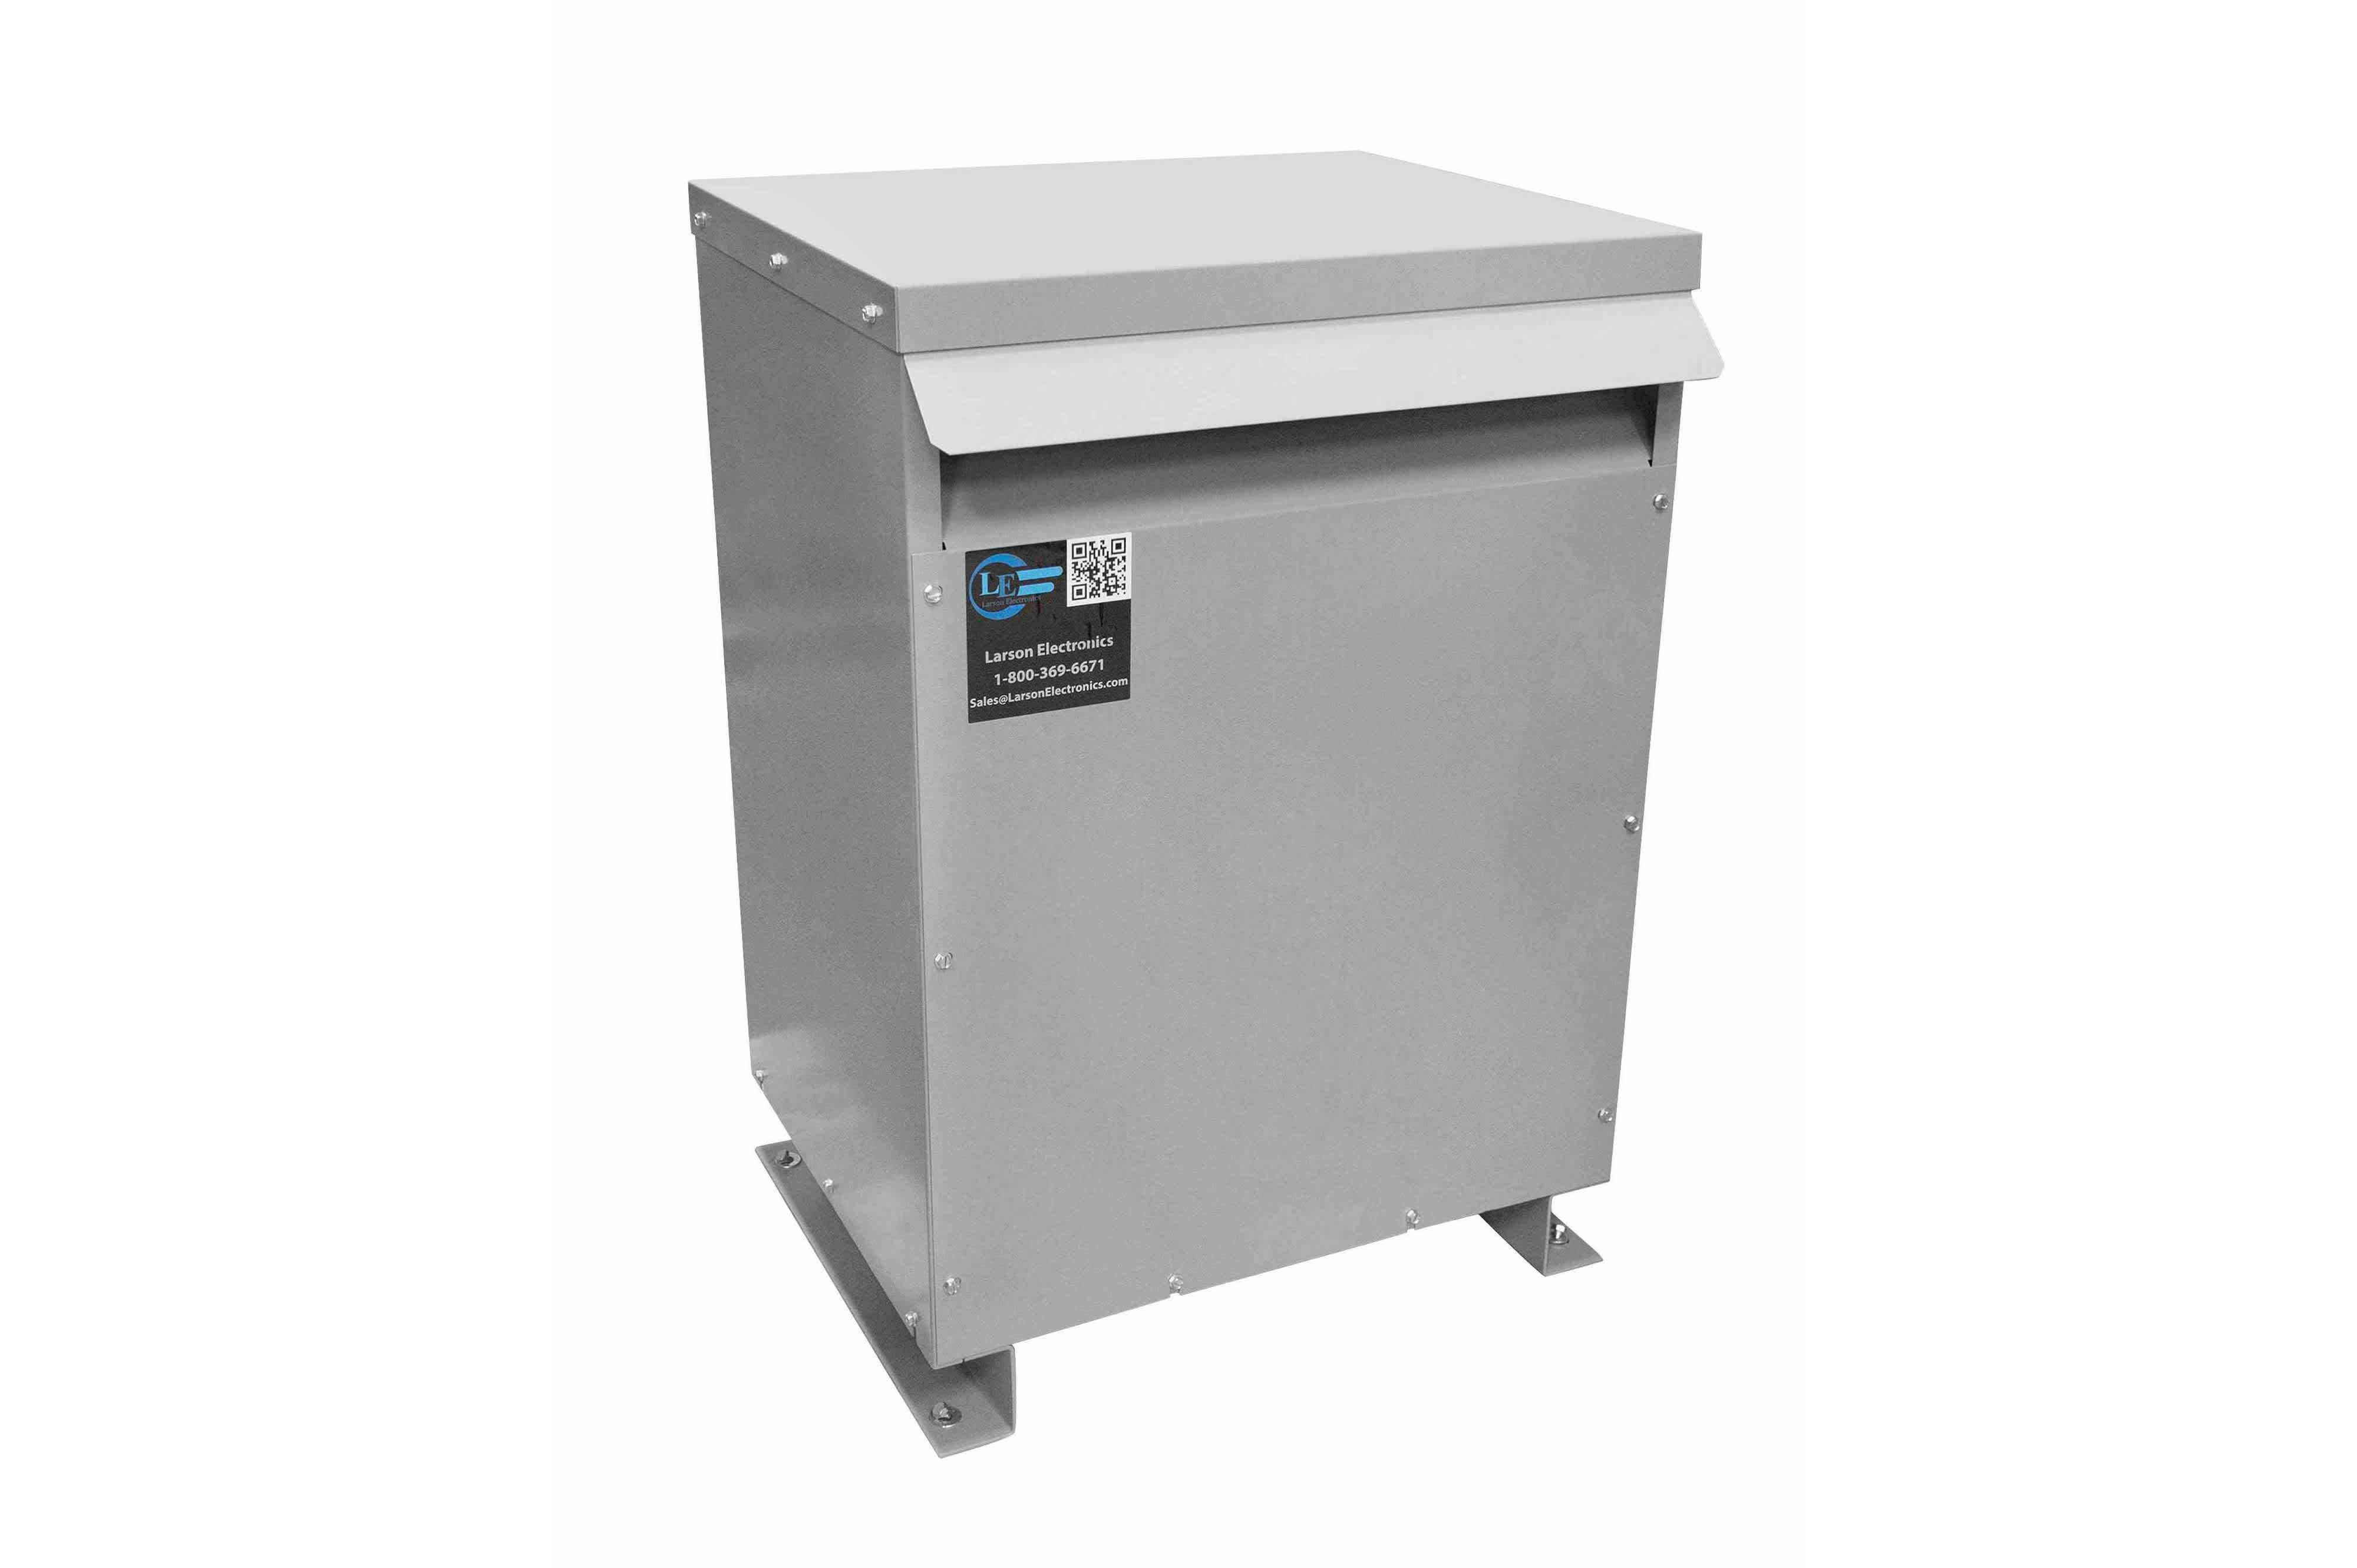 115 kVA 3PH Isolation Transformer, 230V Wye Primary, 480Y/277 Wye-N Secondary, N3R, Ventilated, 60 Hz